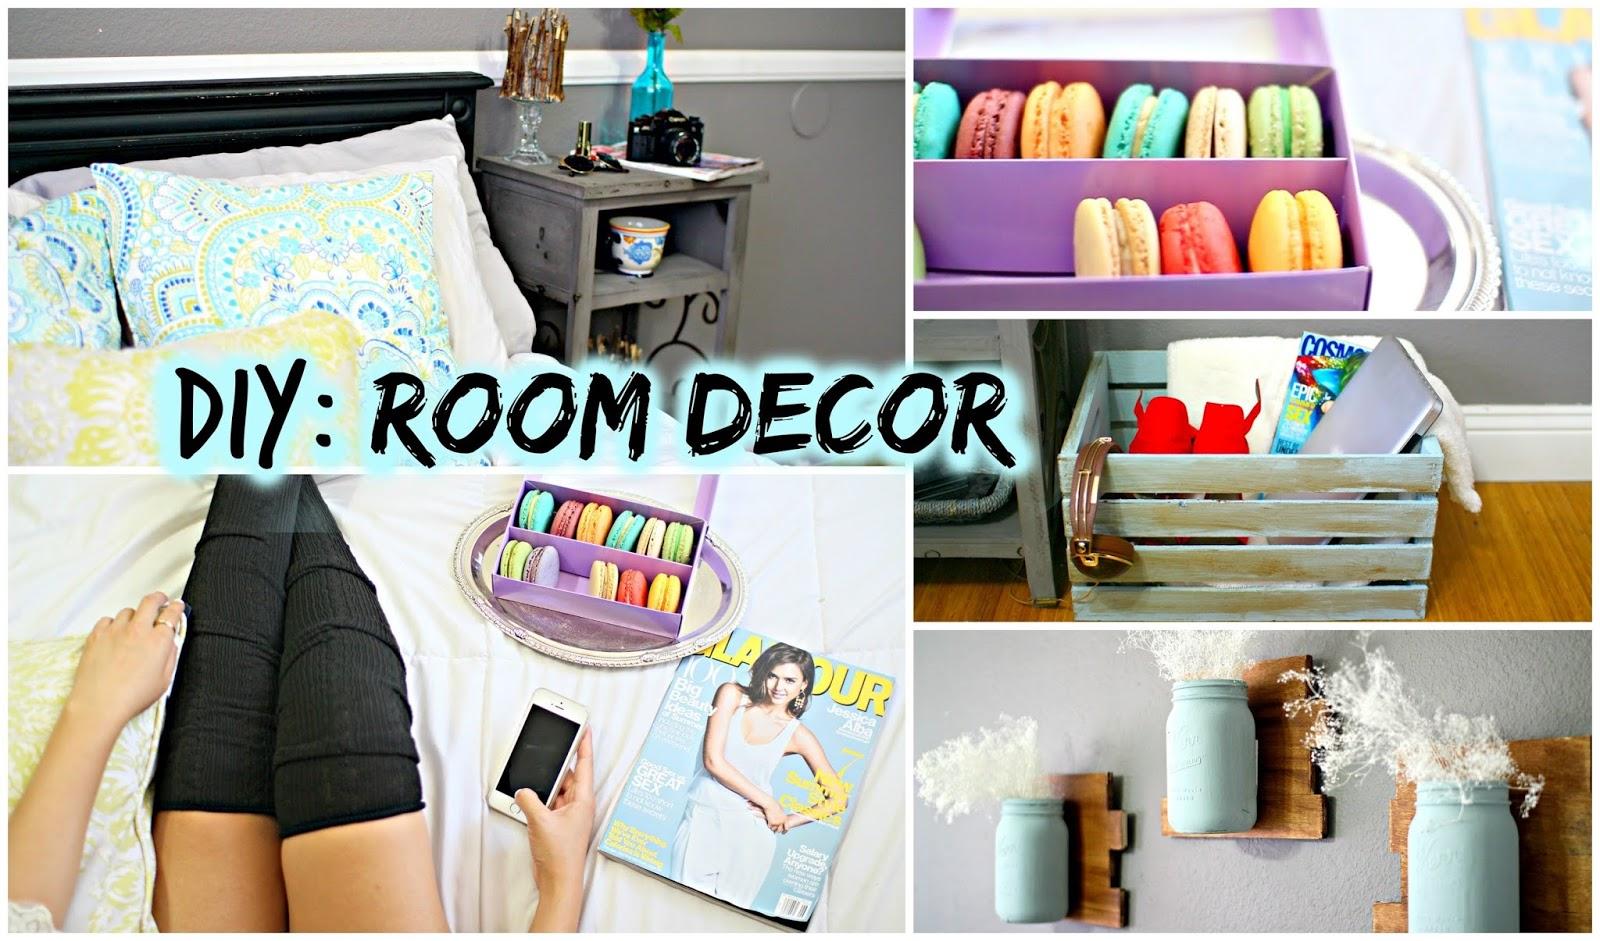 Do it yourself diy home decor ideas diy crafts for home for Diy home decorations ideas